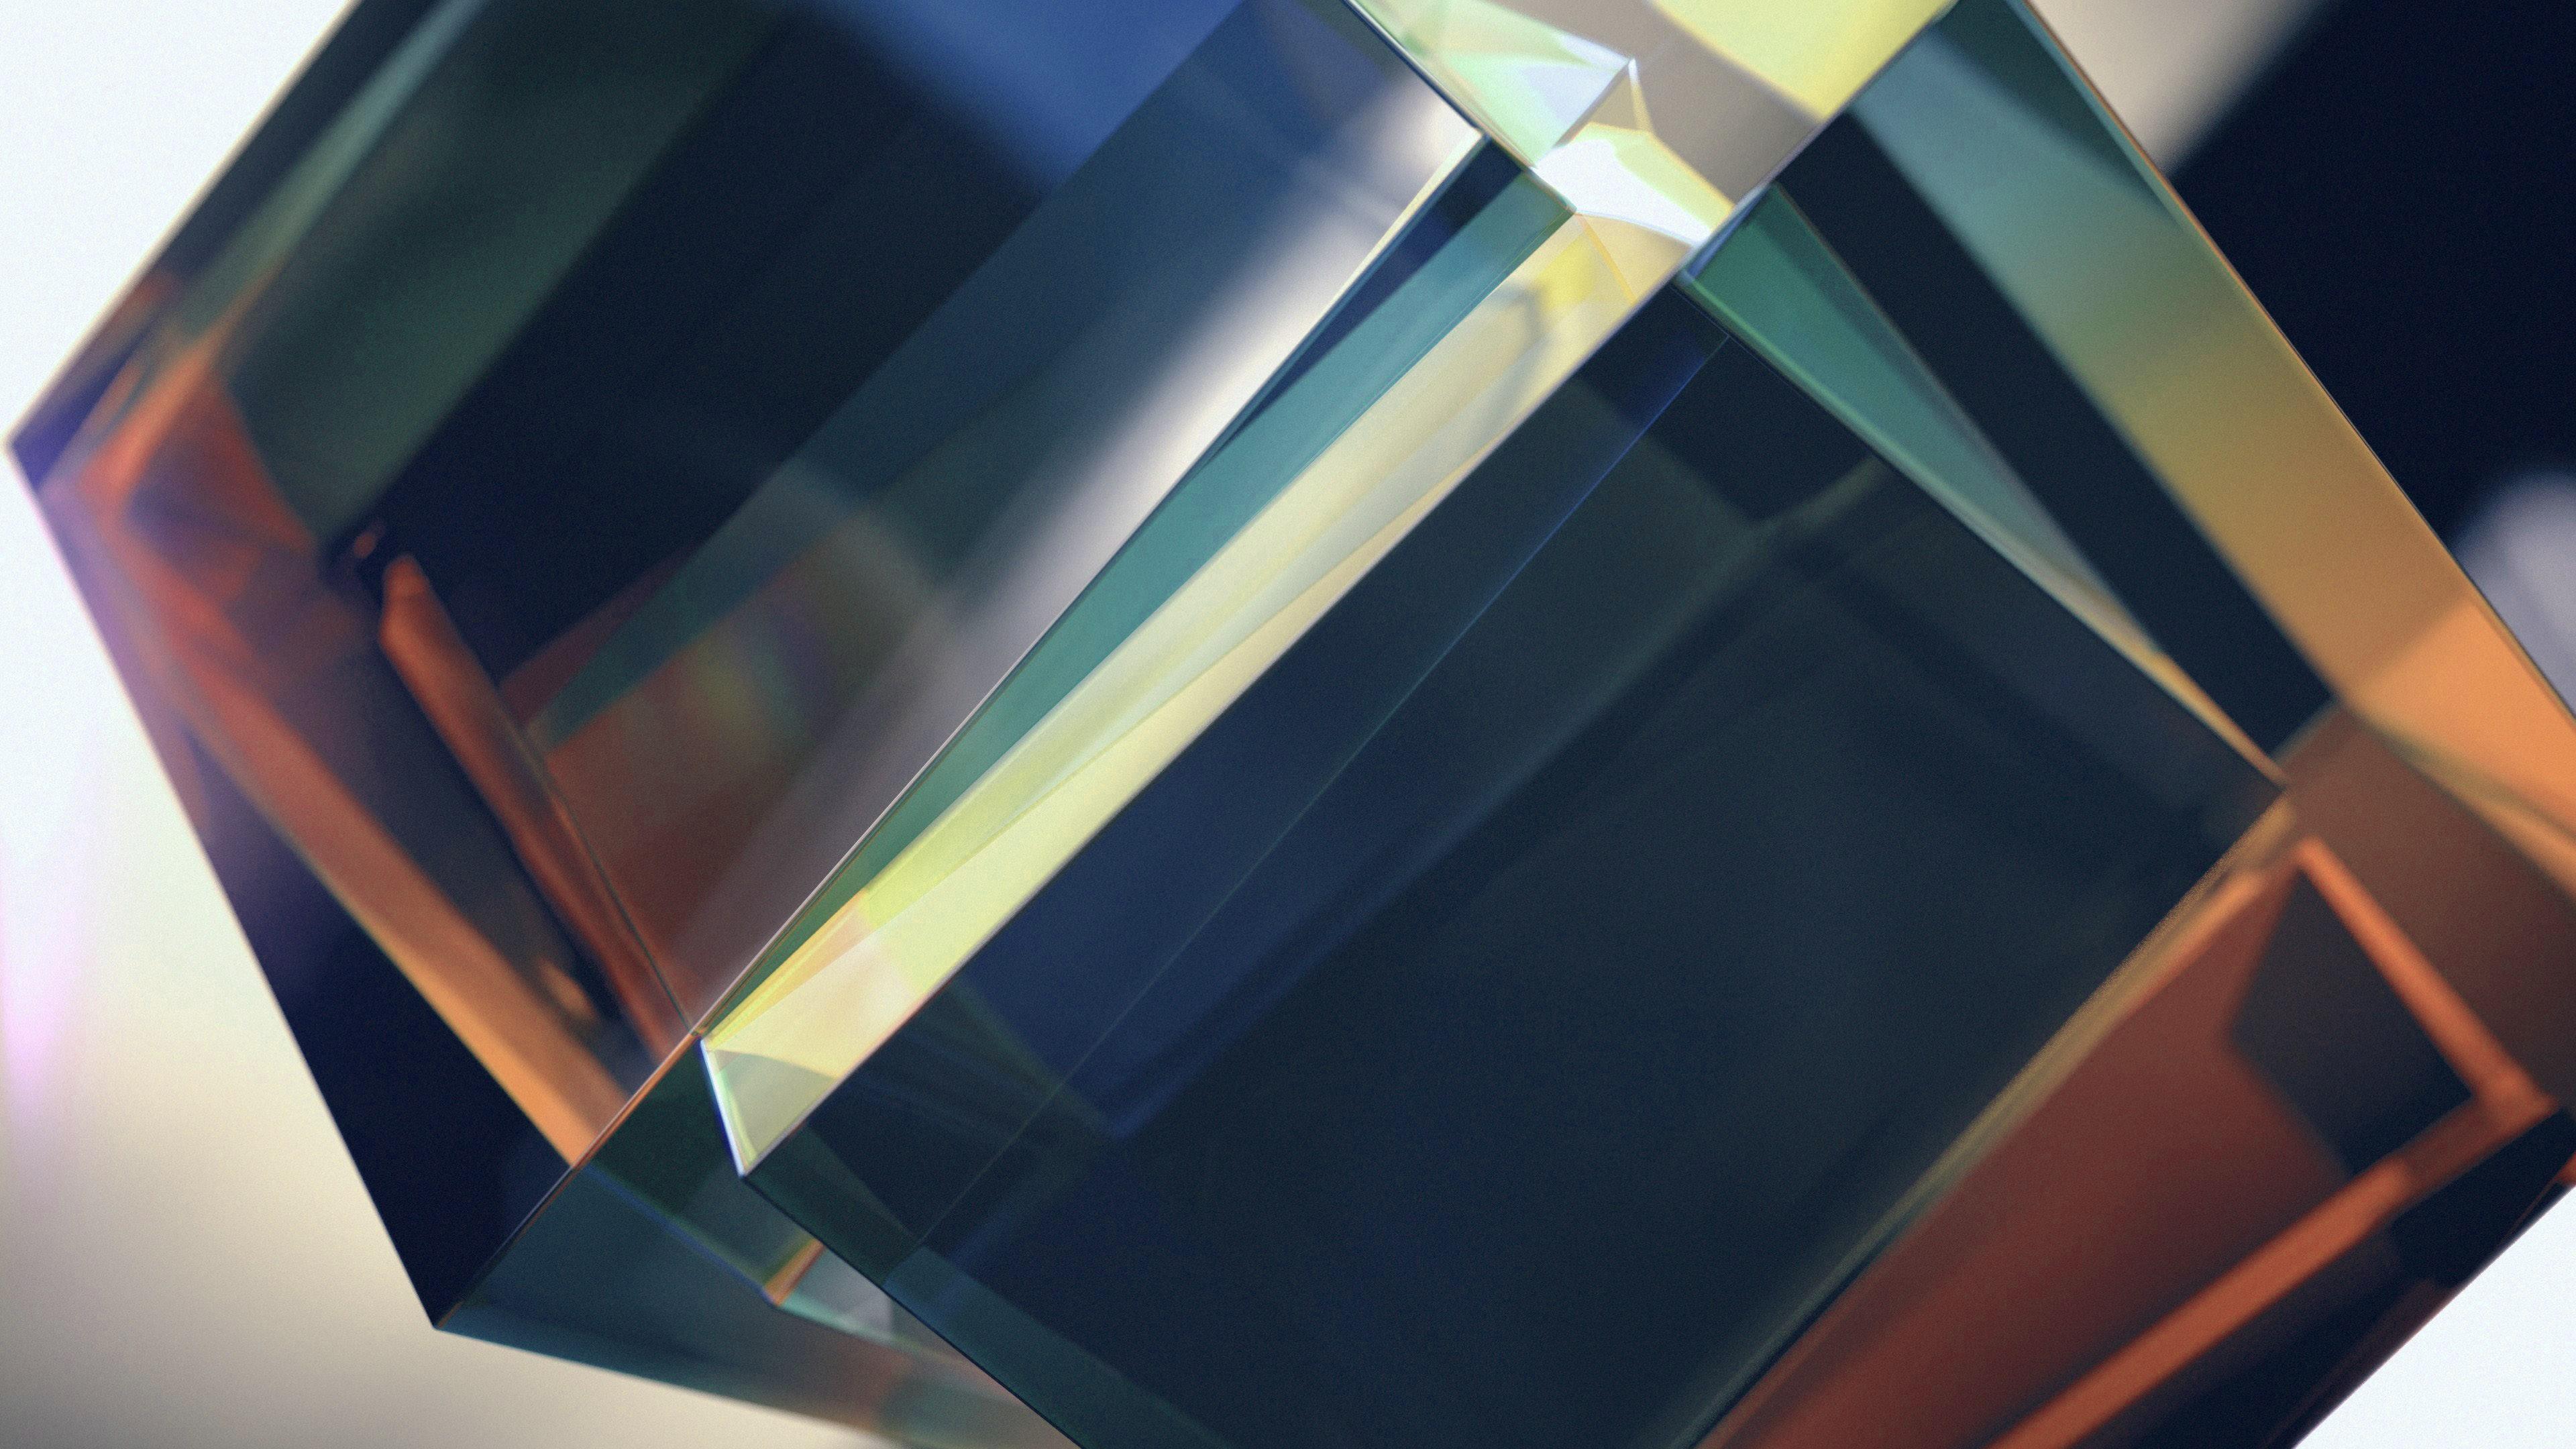 Ipad Mini 3d Abstract Wallpaper: Wallpaper 4k, Abstract, Cubes, 3D, OS #13560